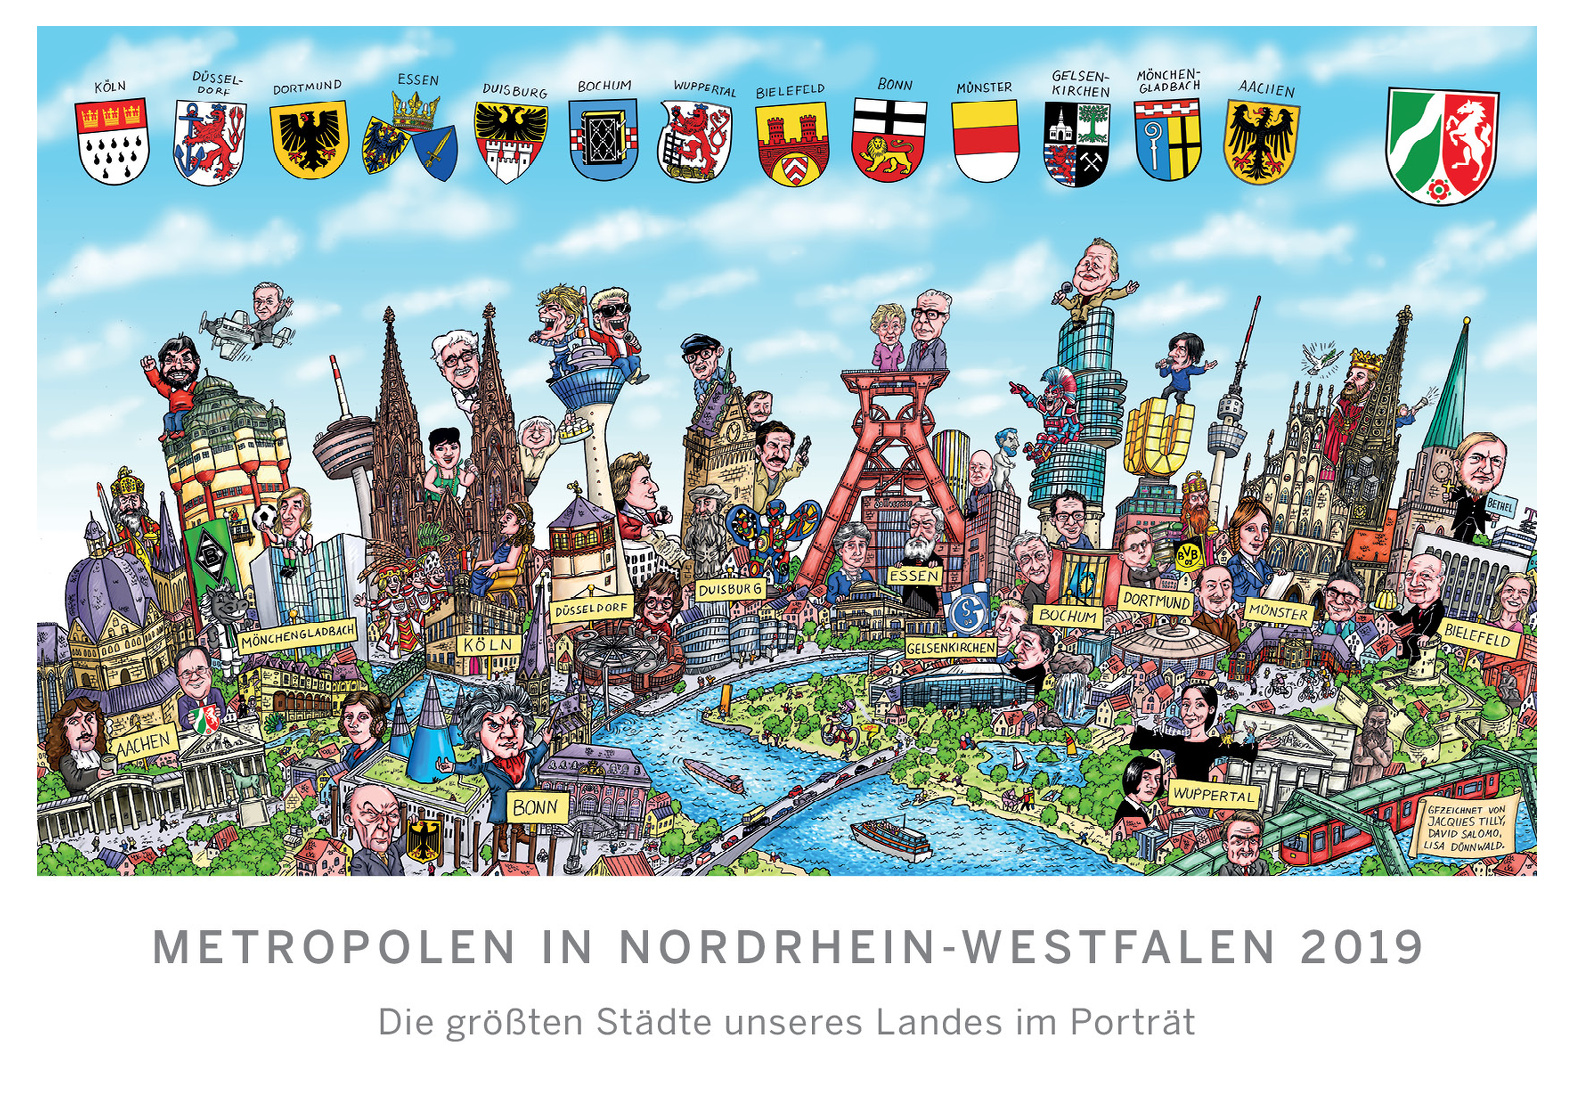 Wwwknastladende Kalender Metropolen In Nordrhein Westfalen 2019